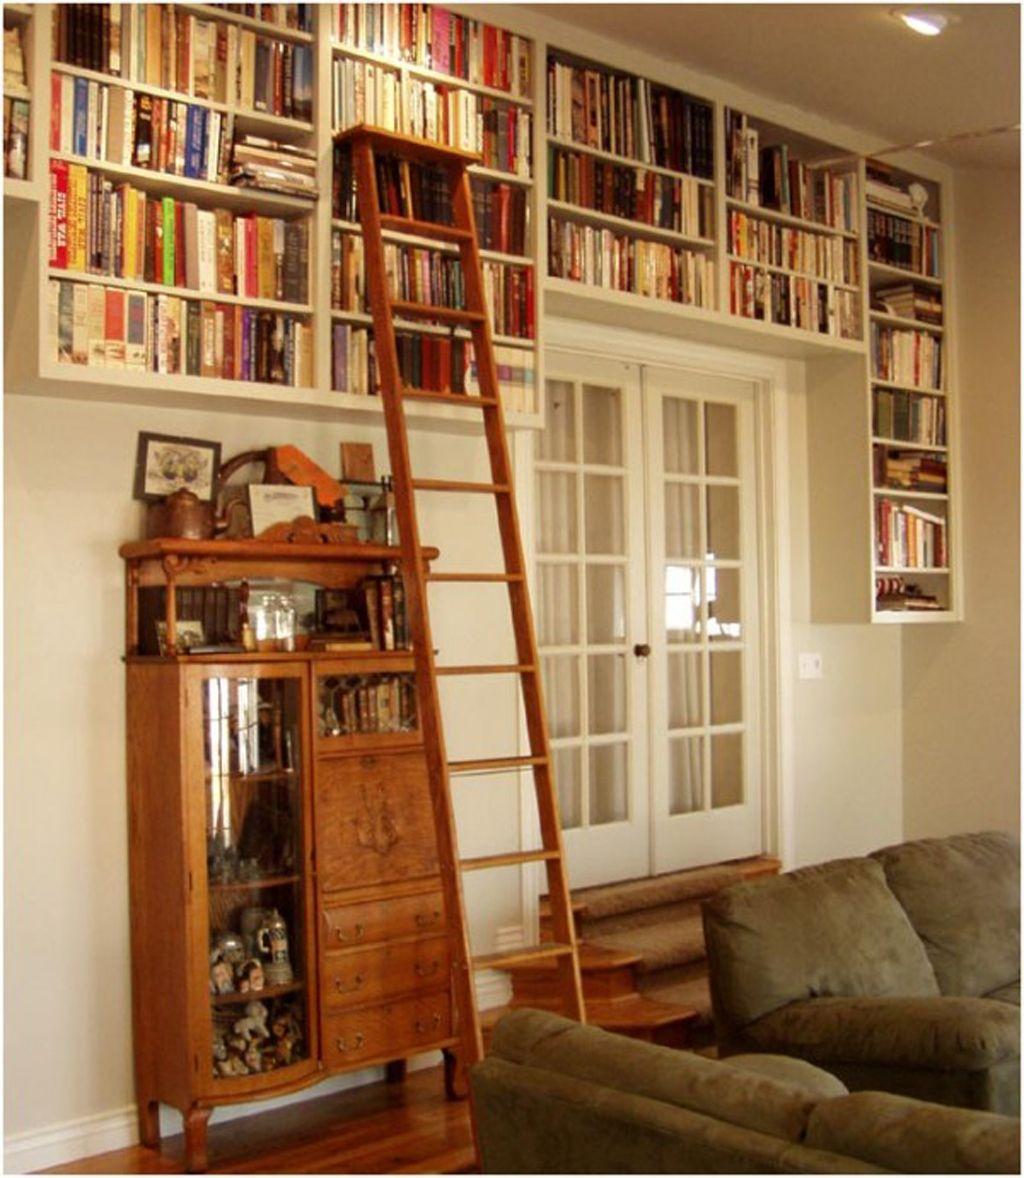 Exquisite Bookshelf Ideas Small Rooms Small Roomsinterior Bookshelf Decorating Design Ideas Design Small Rooms Small Bookshelf Ideas Wall Mounted Design interior Asymmetrical Wall Shelf